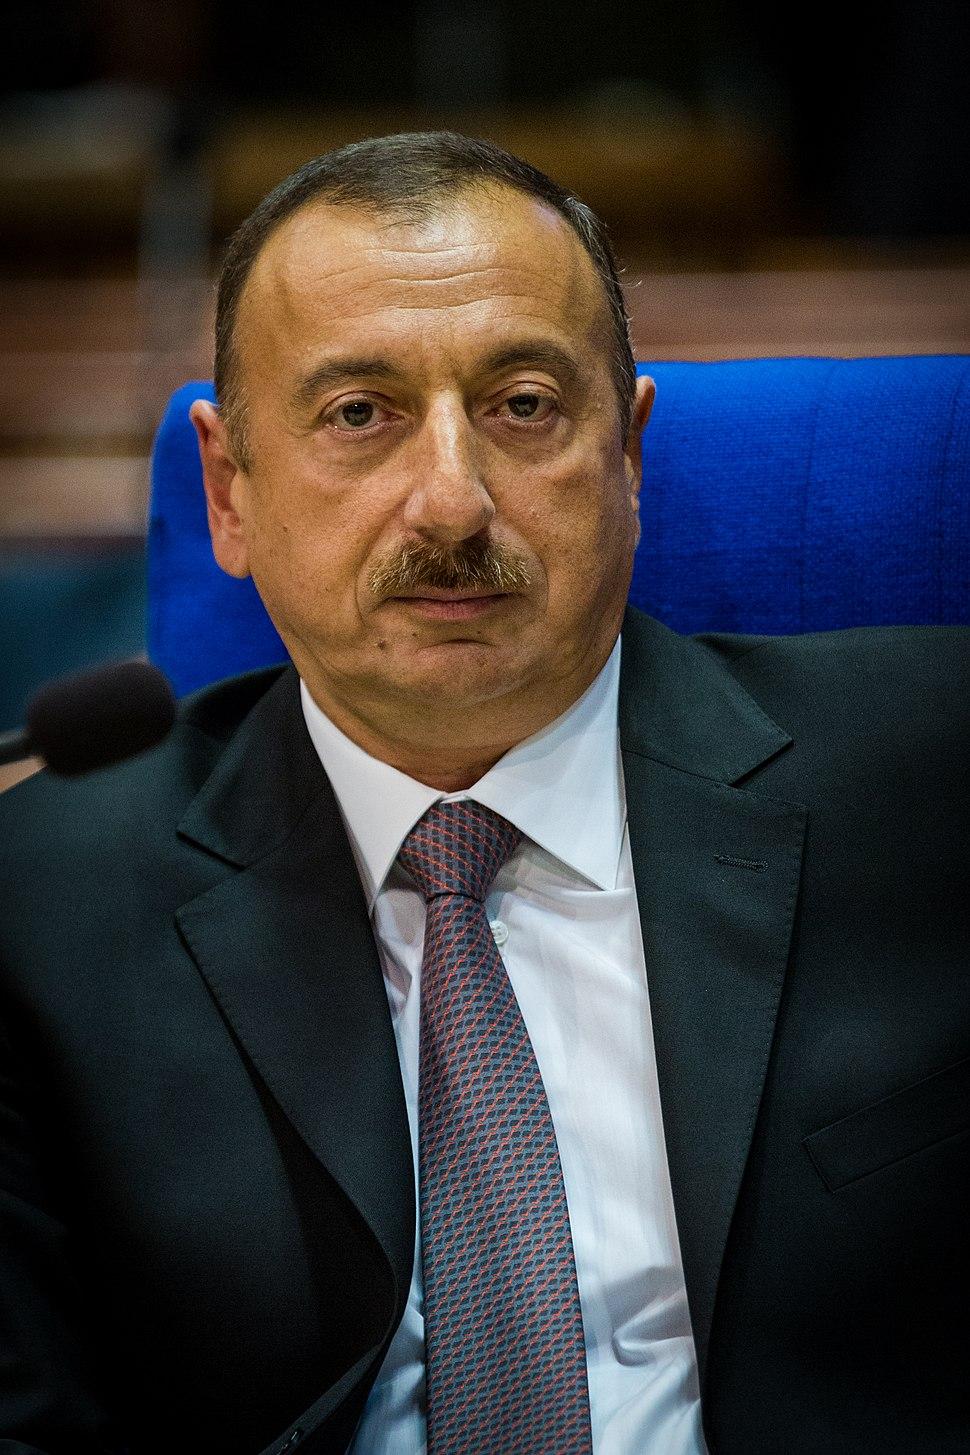 Ilham Aliyev par Claude Truong-Ngoc juin 2014